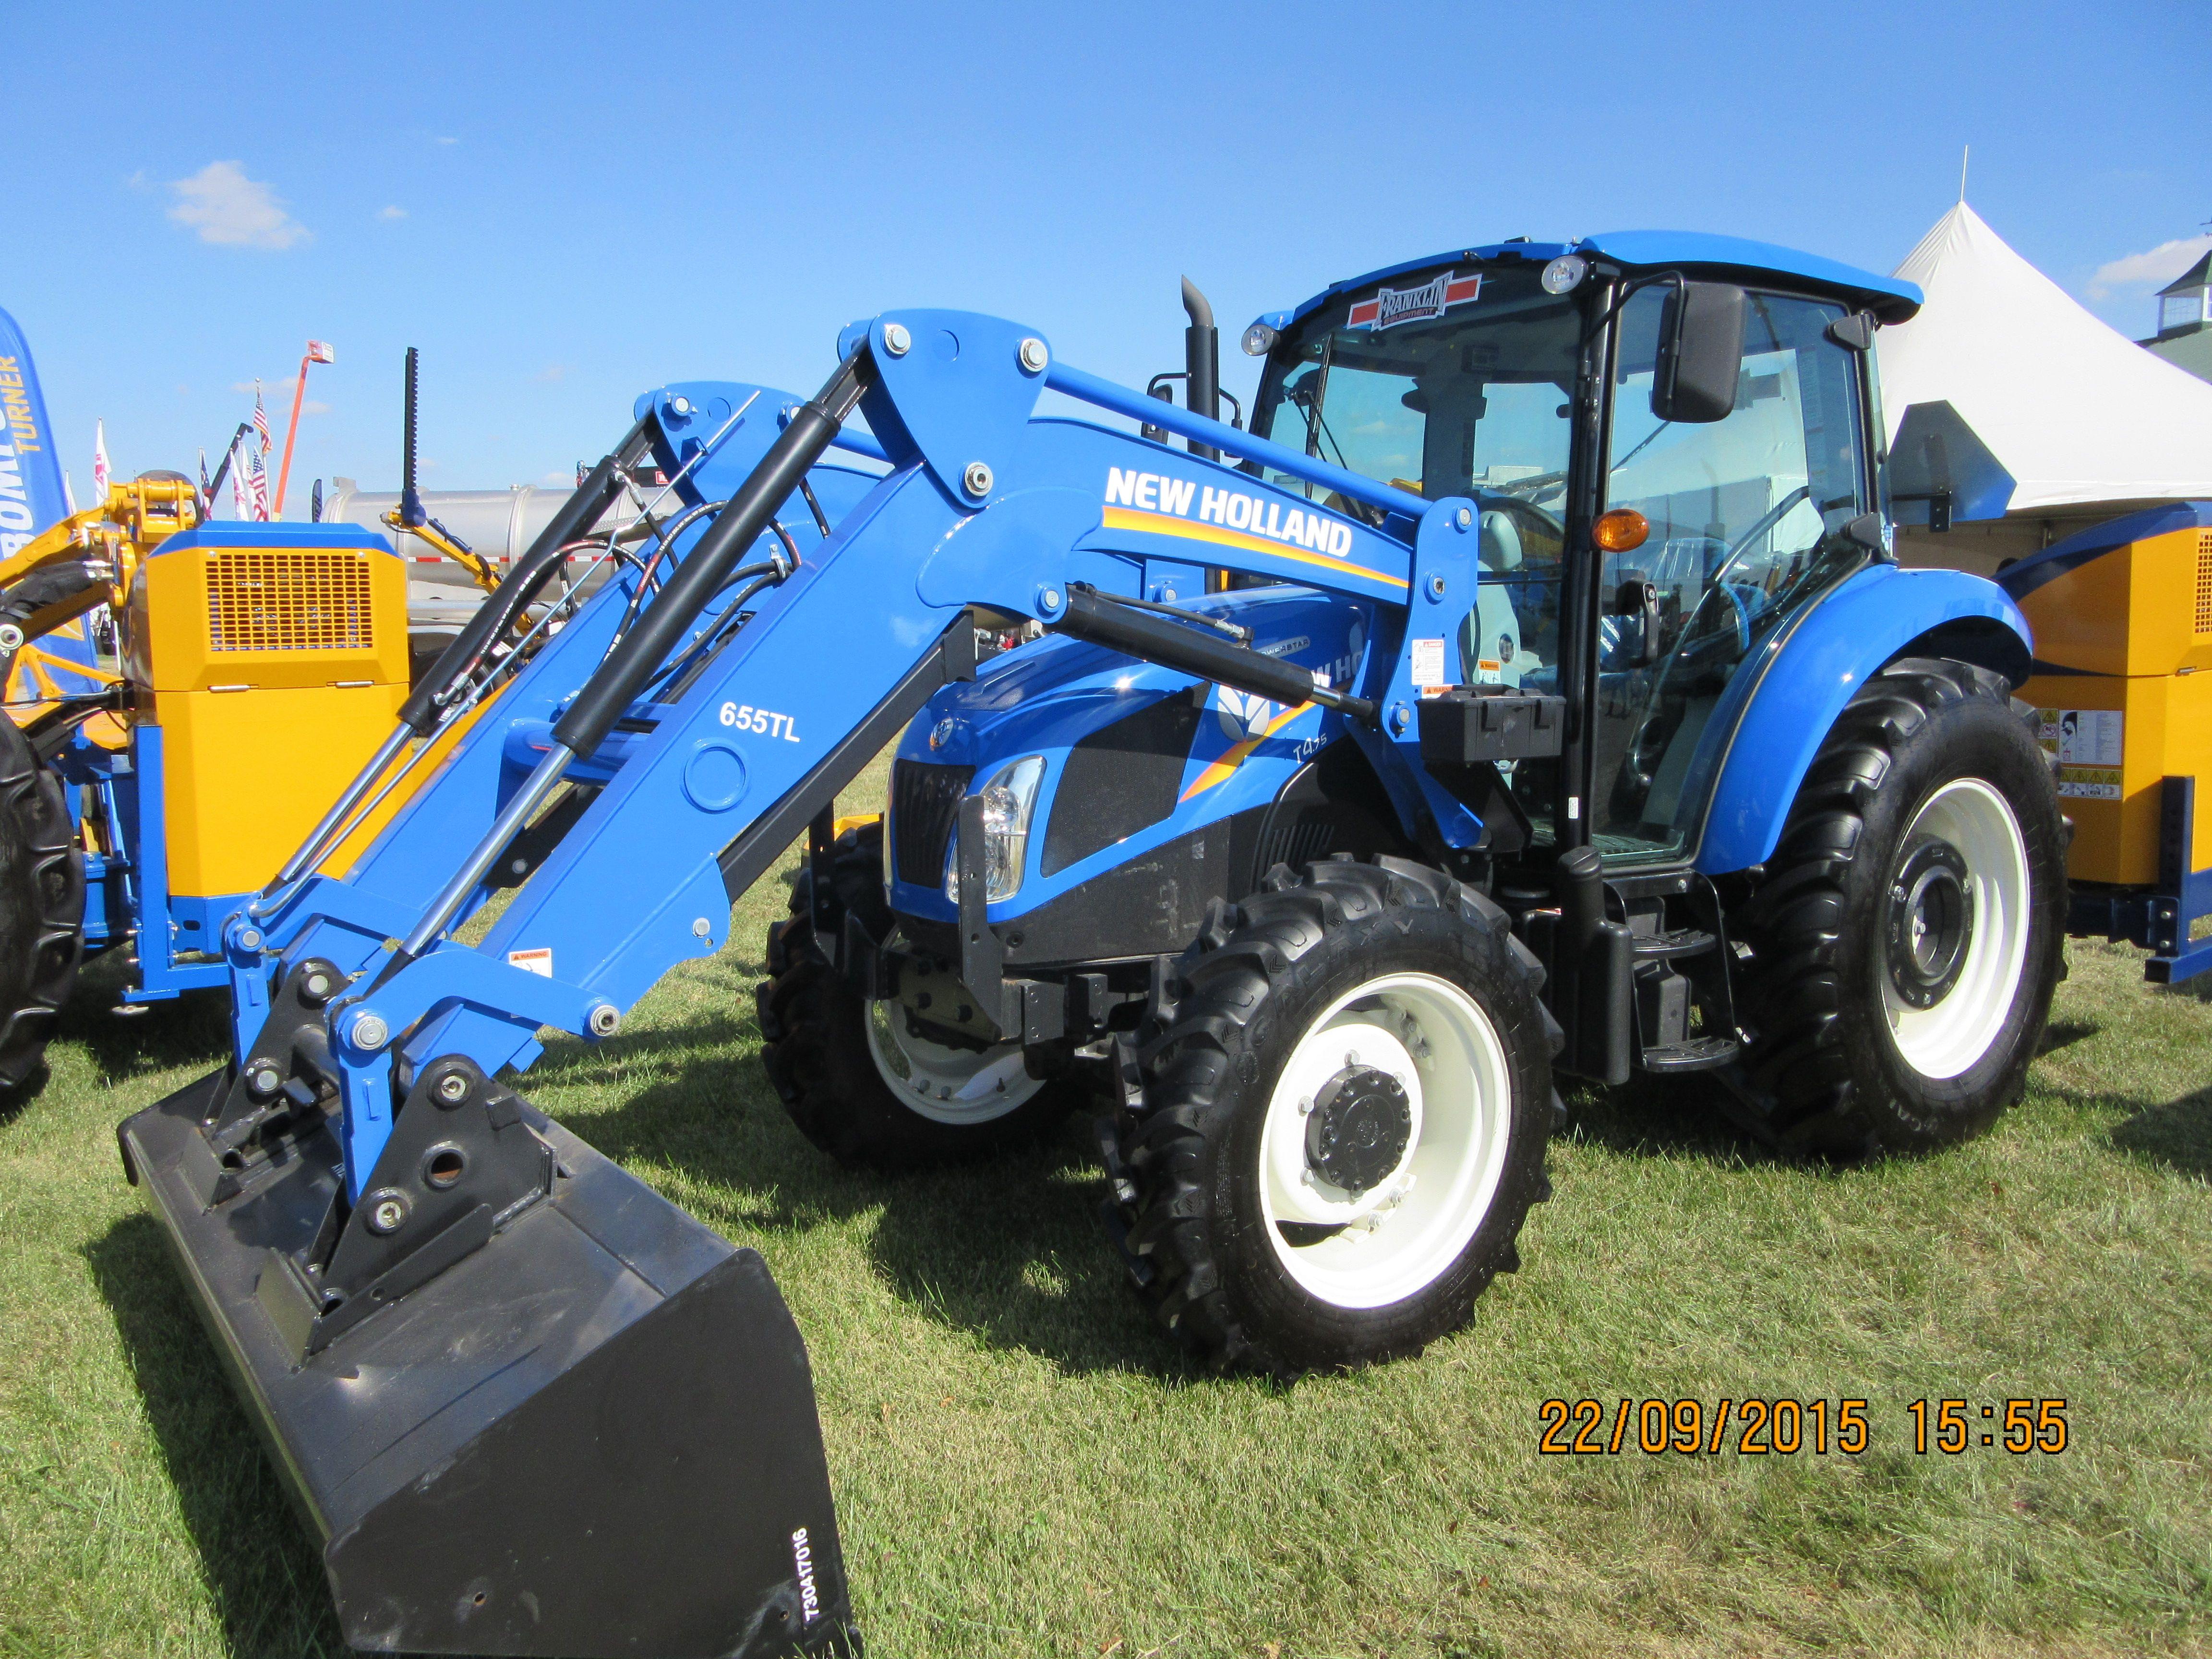 New Holland T4 75 & 65TL loader | New Holland farm equipment